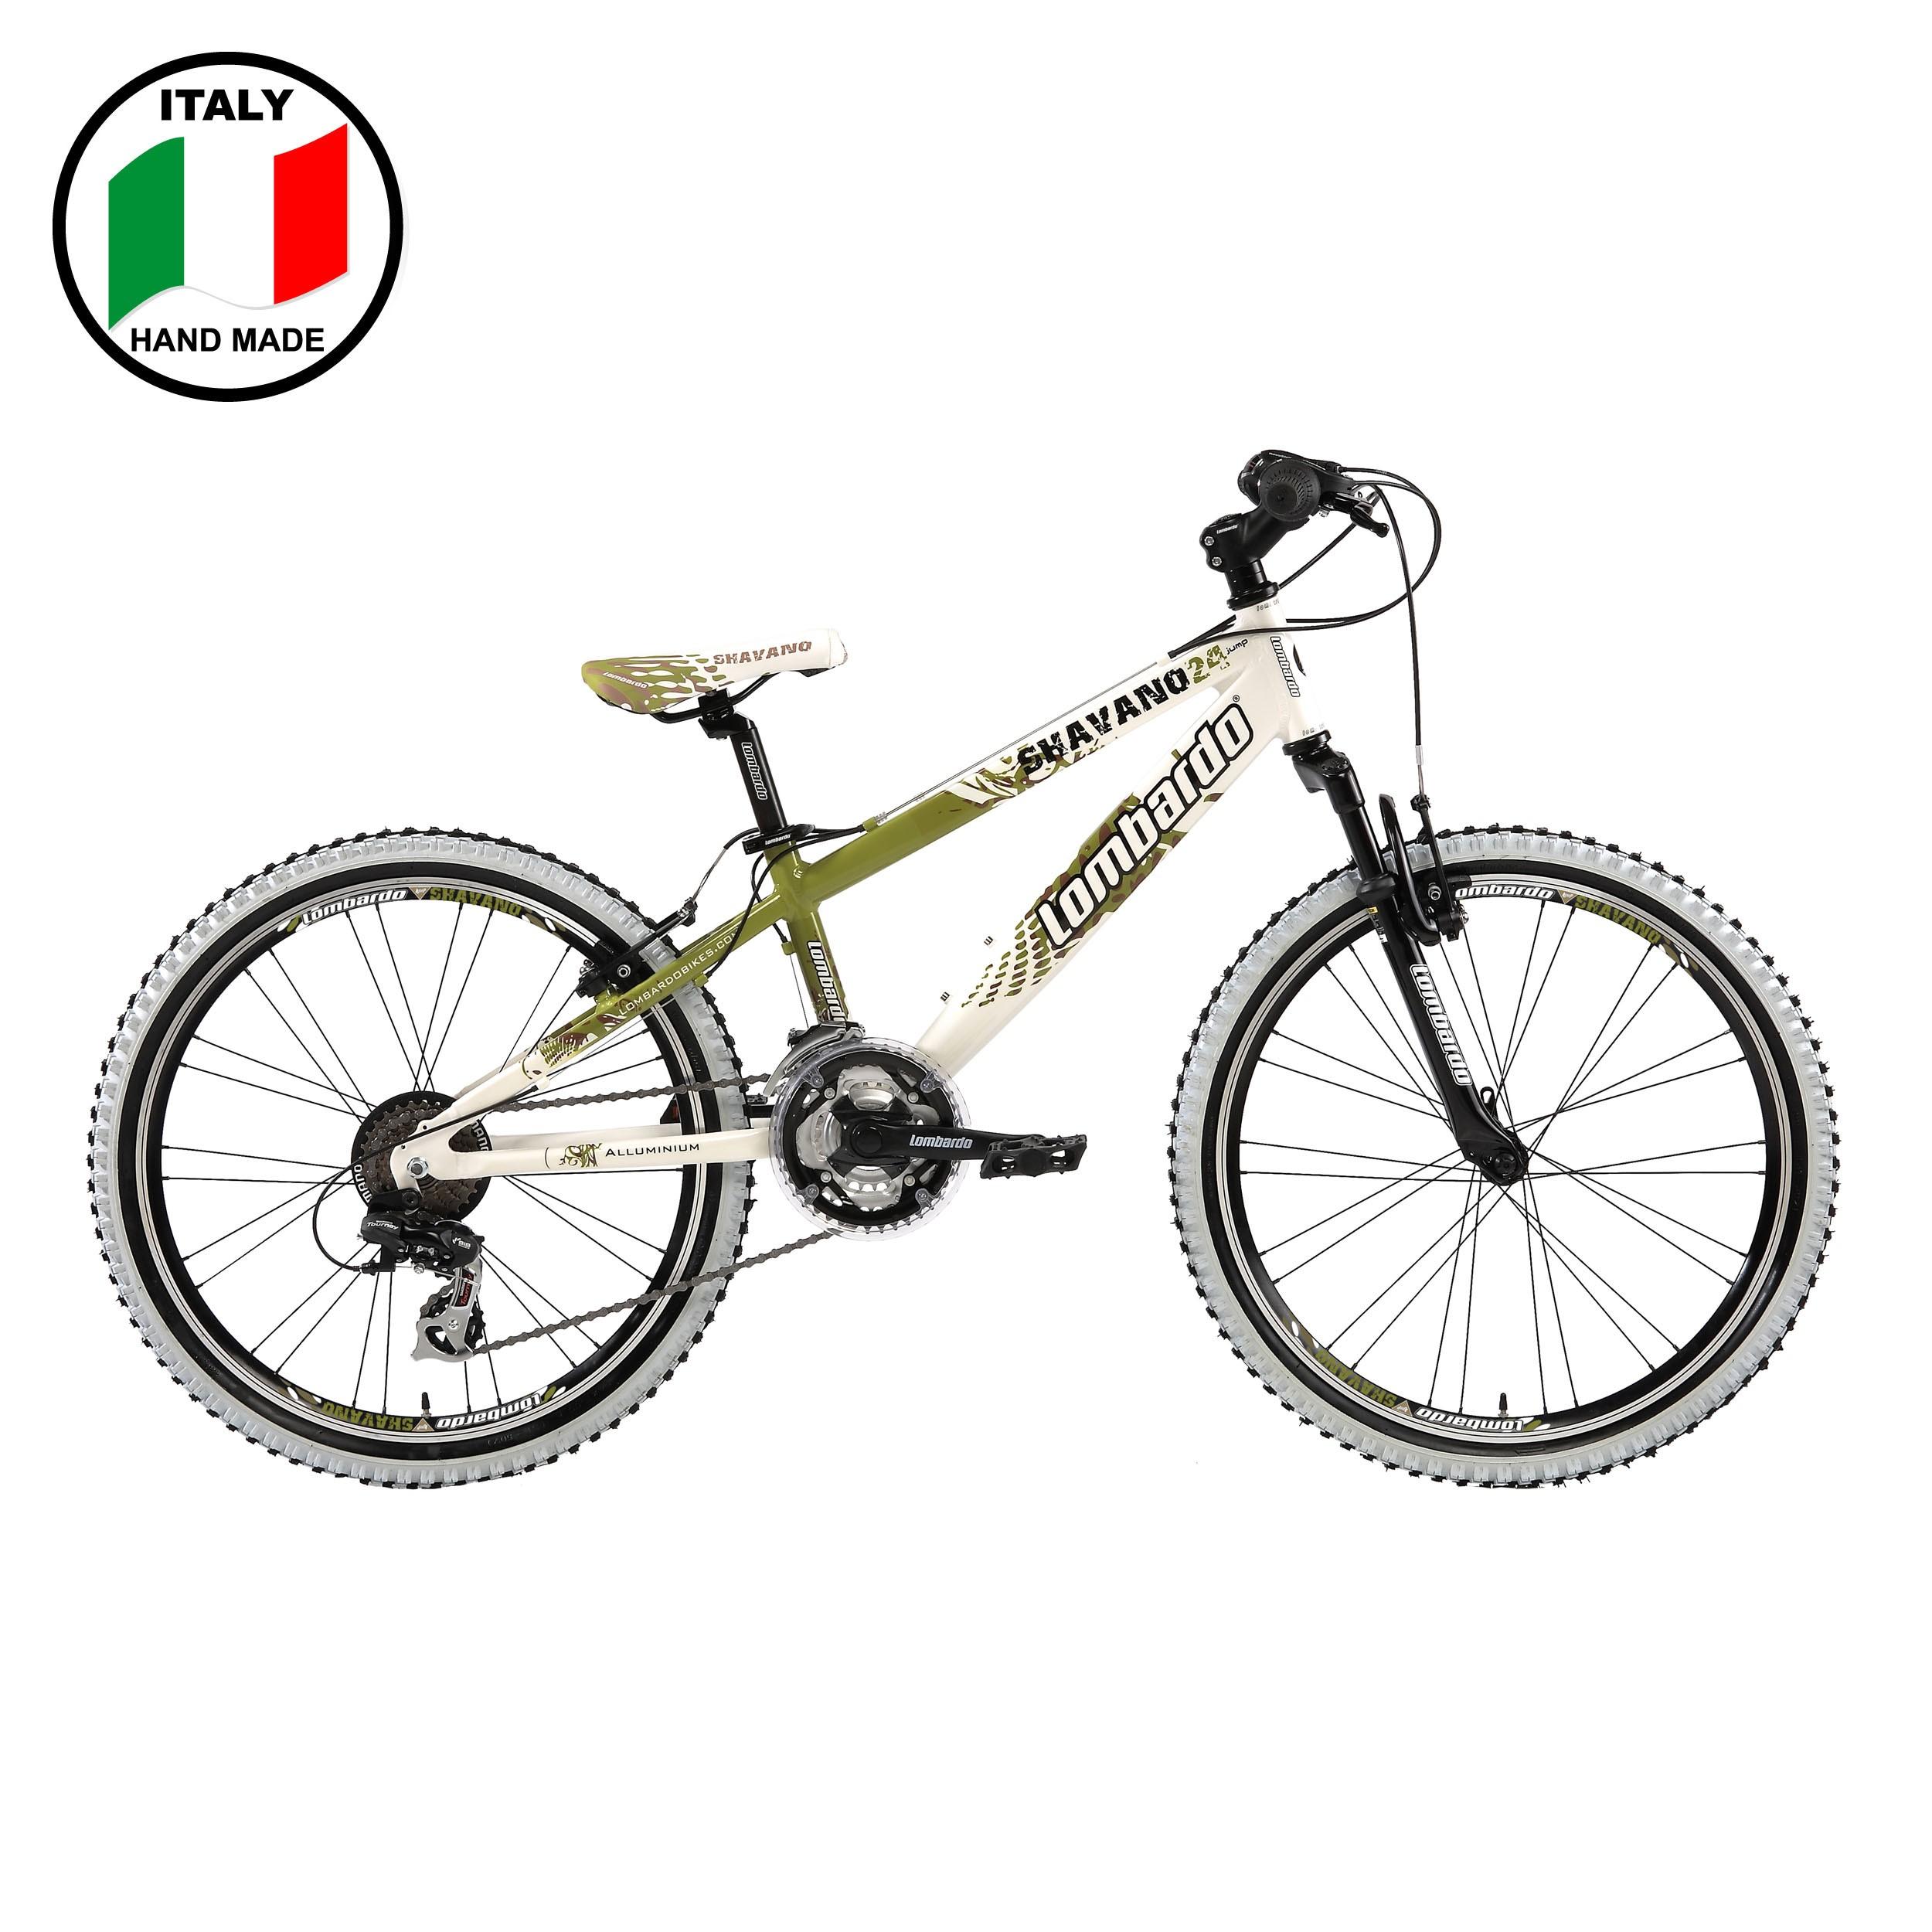 Lombardo Shavano 24 inch Bike